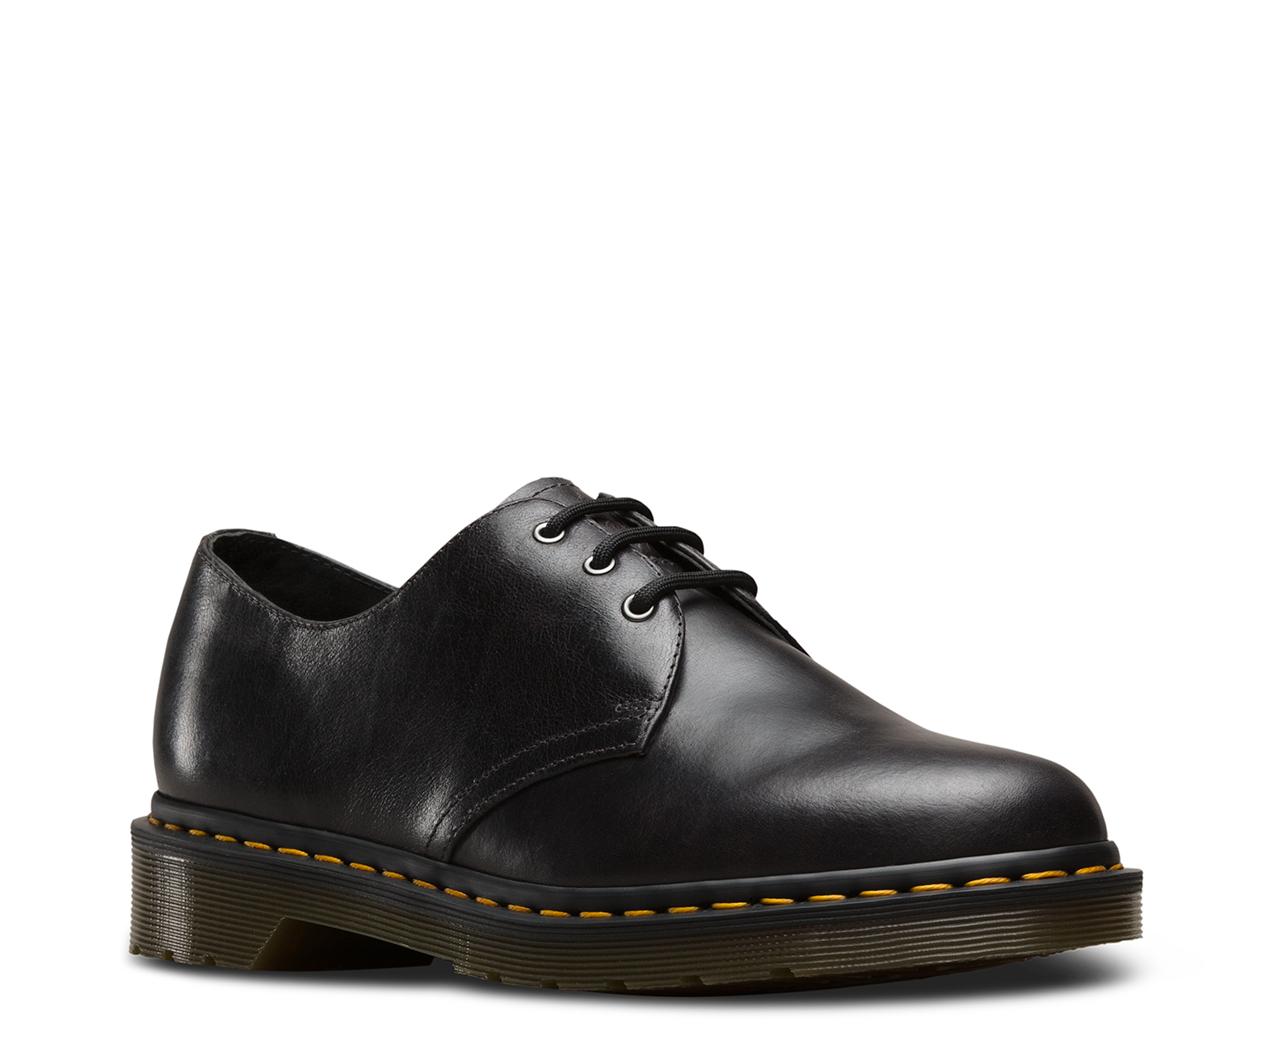 Dr.Martens Mens 1461 3 Eyelet Gunmetal Leather Shoes 41 EU J0AIxd8m